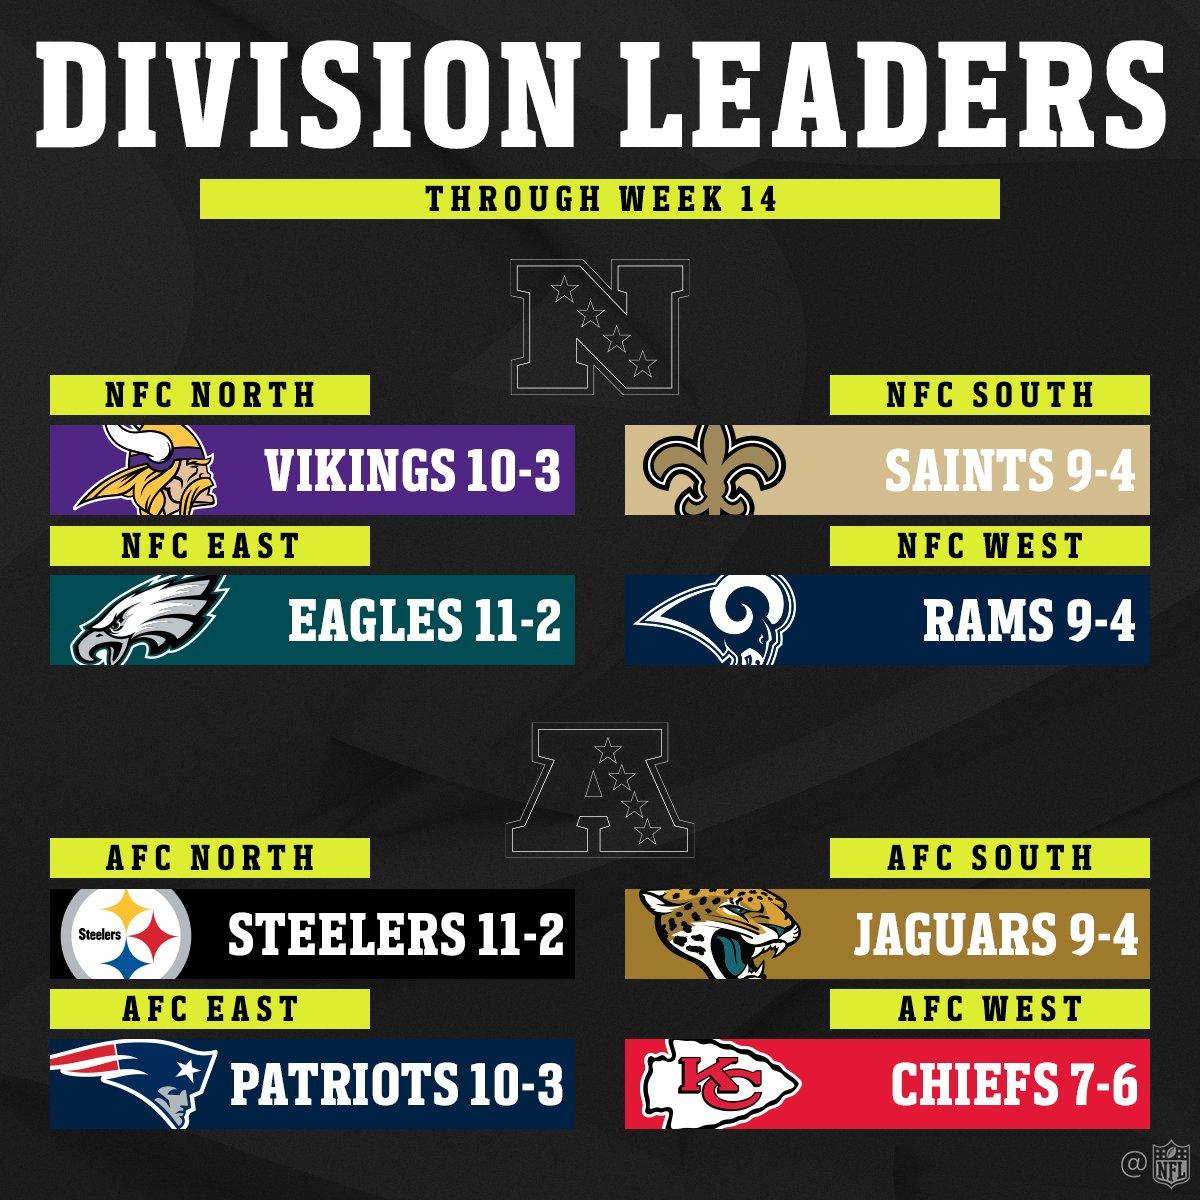 2017 Division Leaders! (Through Week 14)